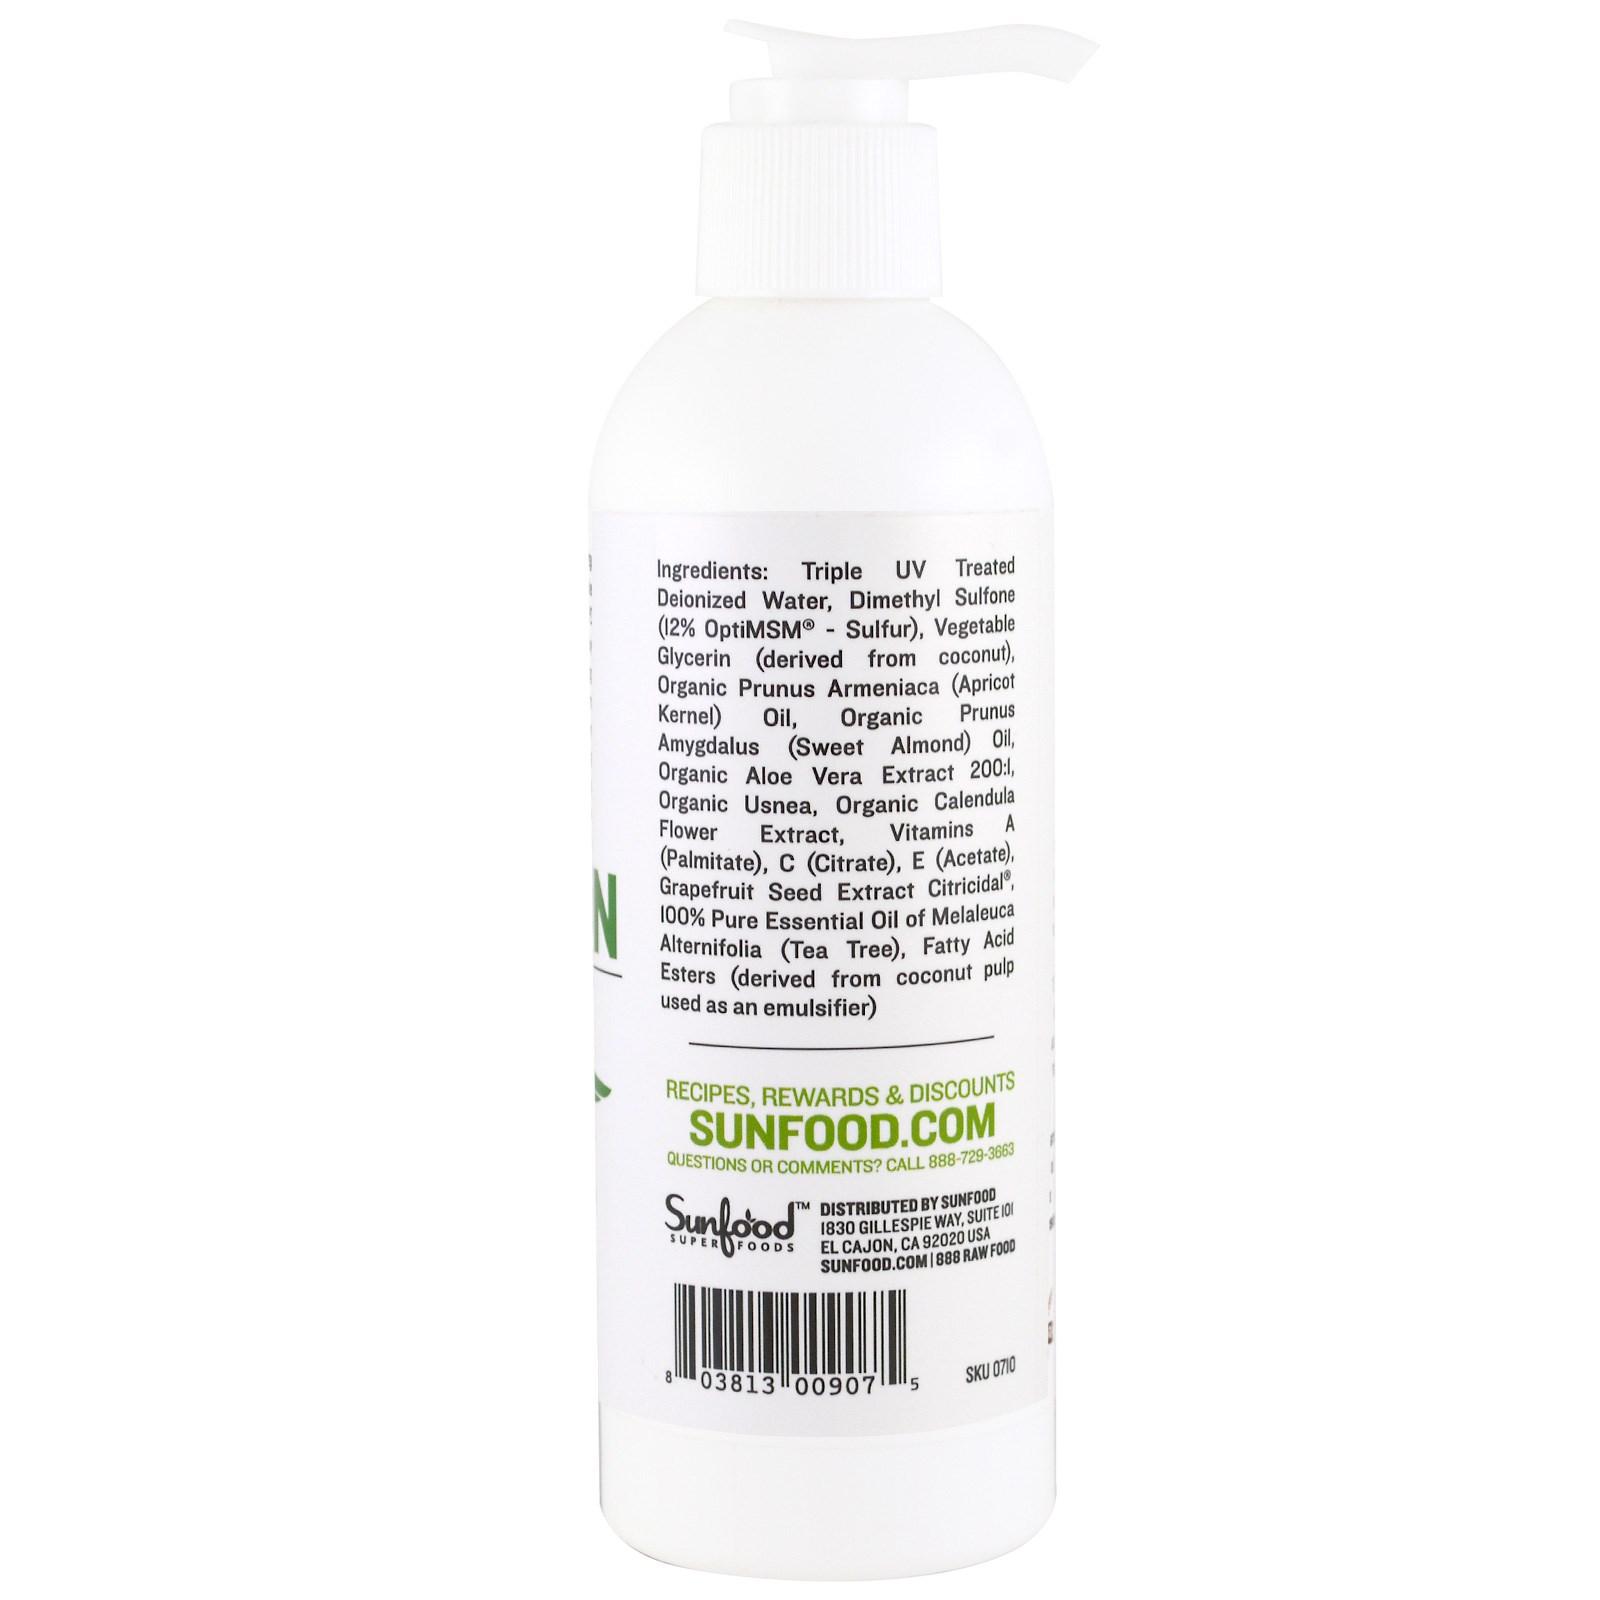 Sunfood, Medicinal MSM Lotion, Rejuvenating Cream, 8 fl oz (236 6 ml